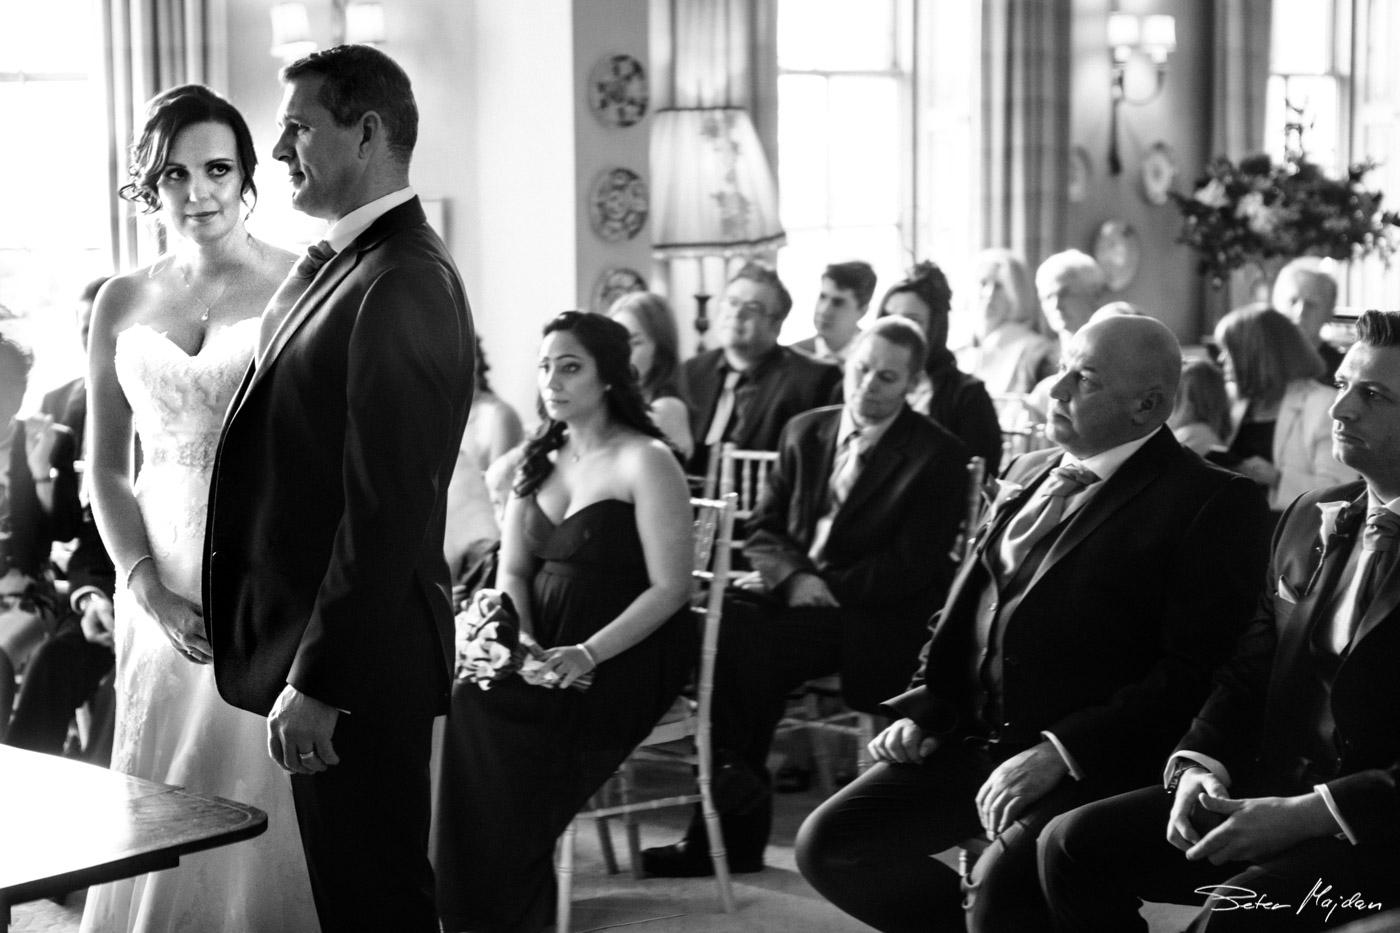 east-bridgford-hill-wedding-photography-27.jpg